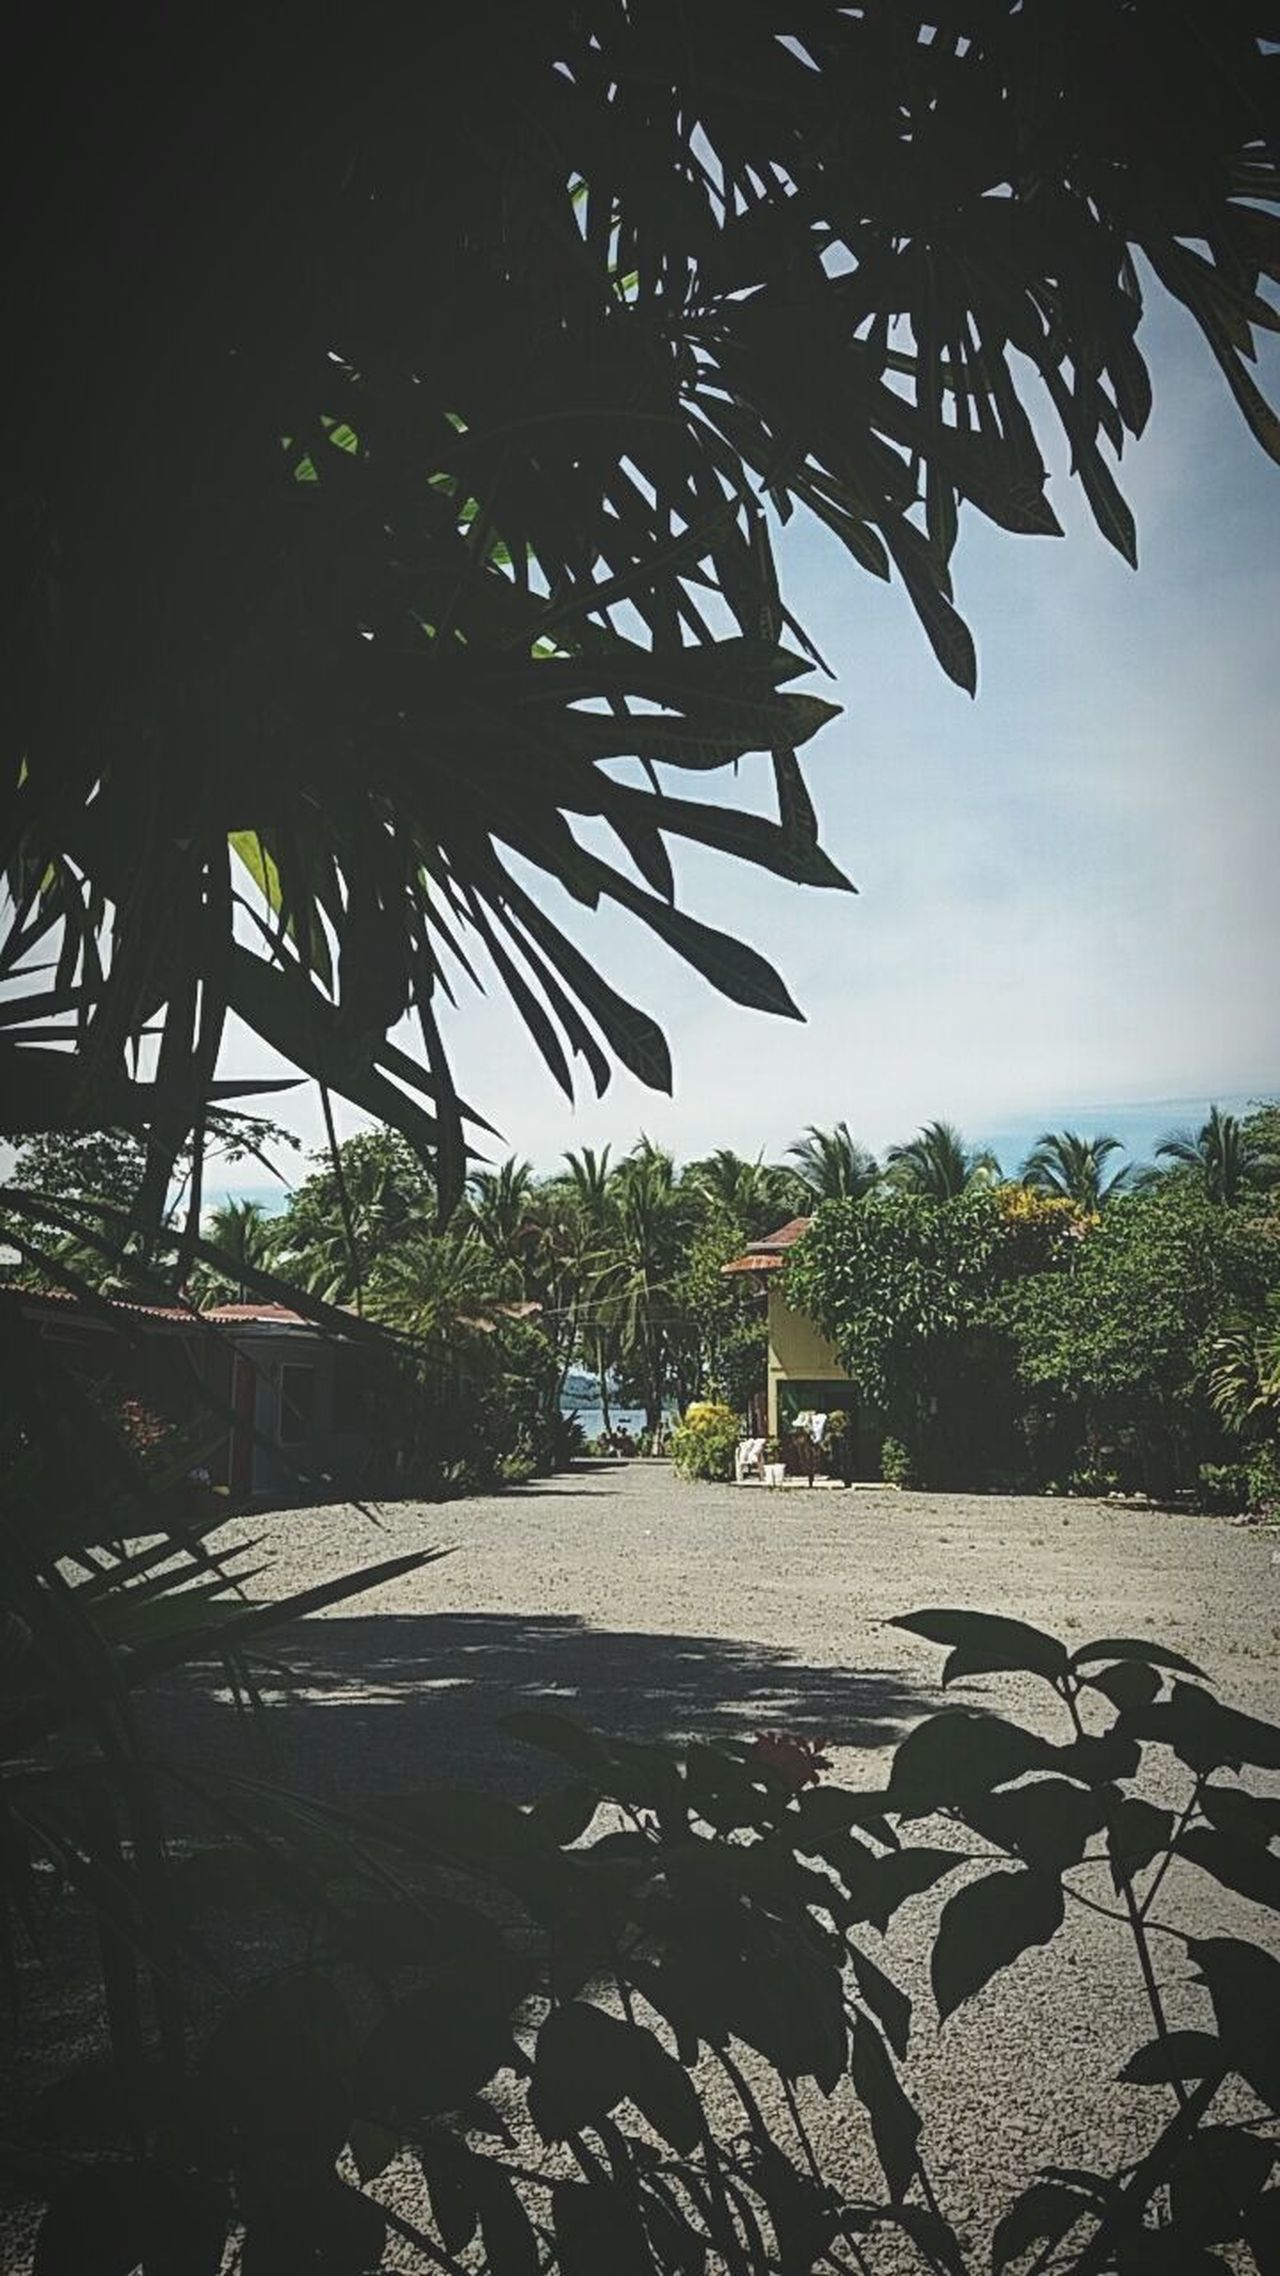 Pura Vida 🤘 🏖 No People Nature Outdoors Palm Tree Sky Water Day Costa Rica Pura Vida ✌ First Eyeem Photo